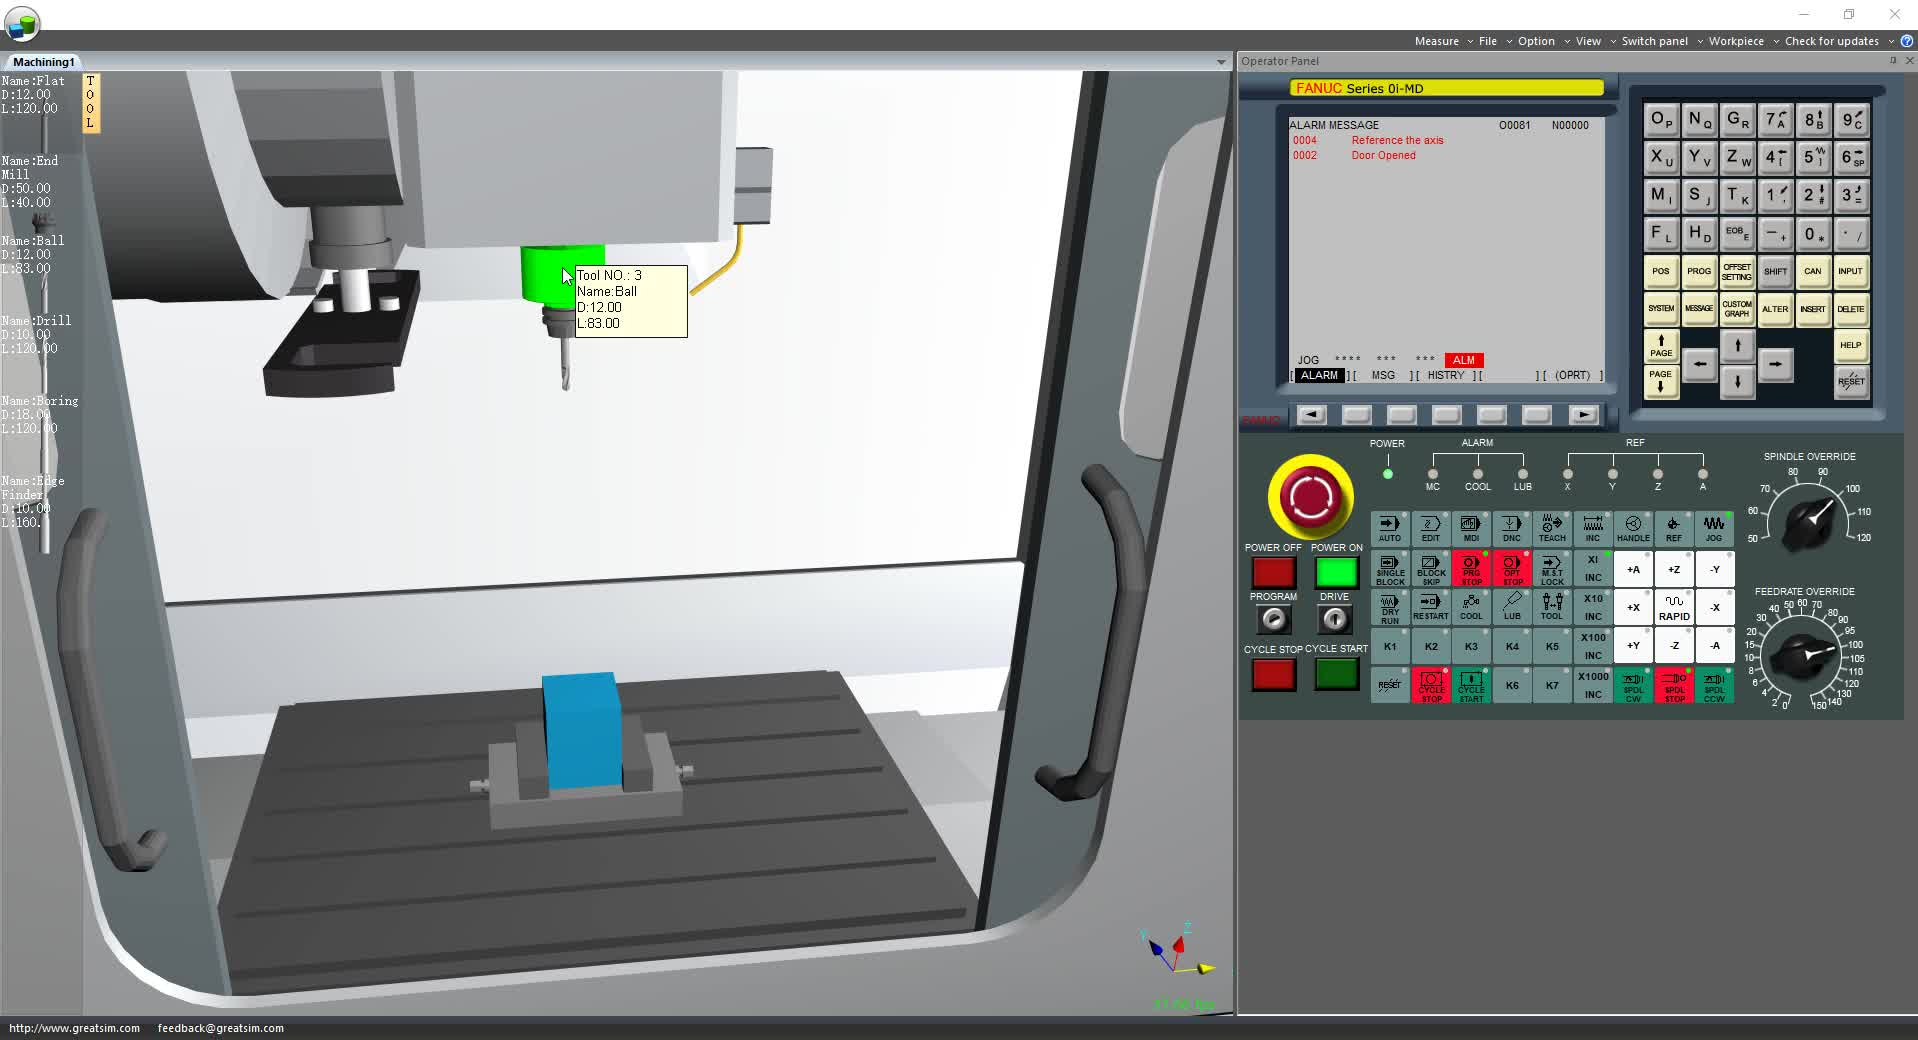 Machining数控加工中心发那科对刀以及G51.1镜像调用子程序演示